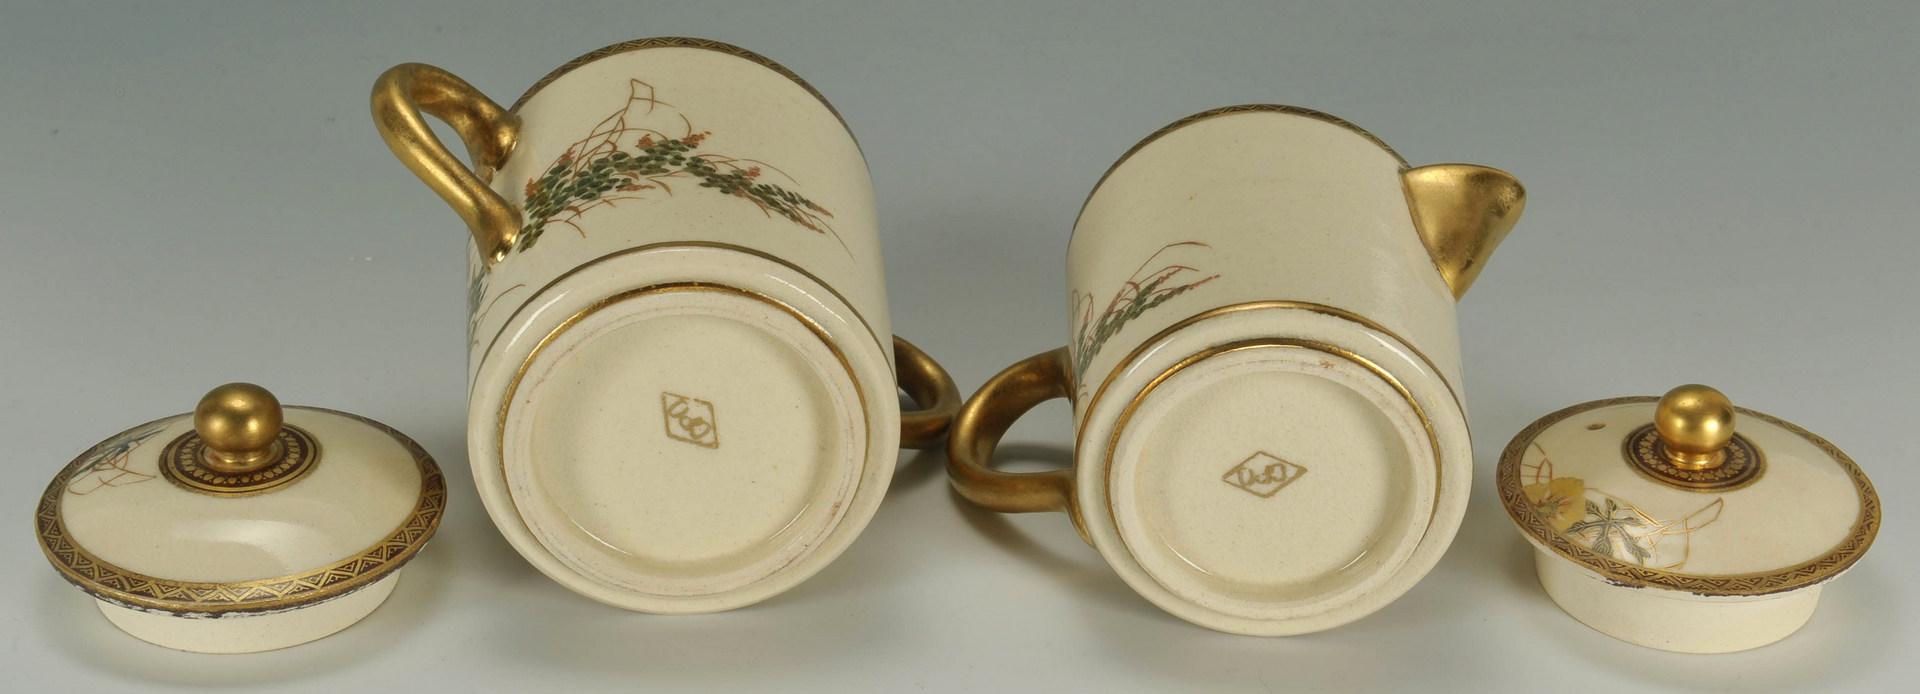 Lot 483: Japanese Satsuma Coffee Set, 9 pieces